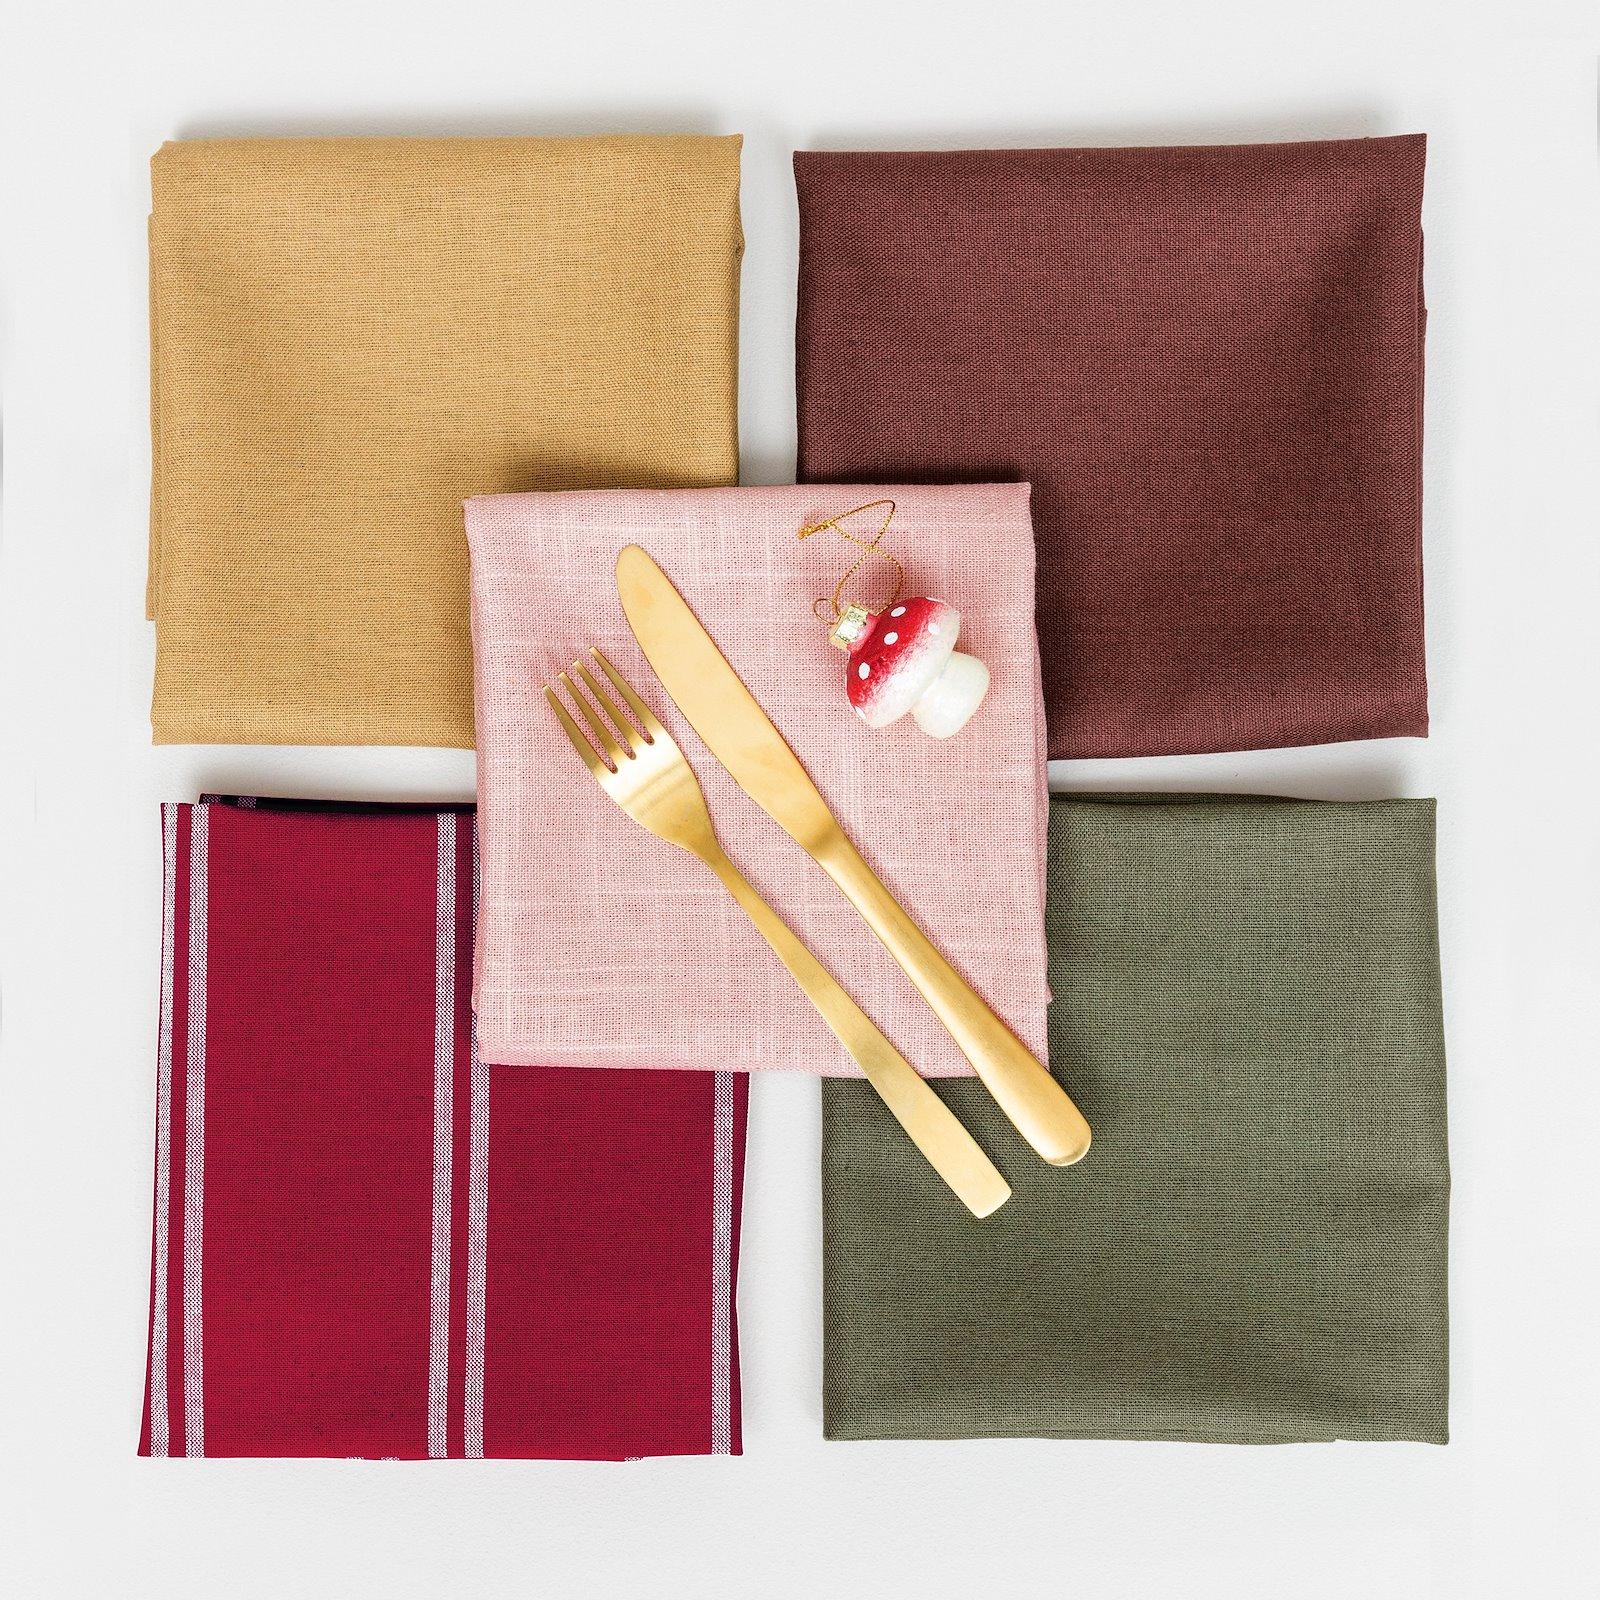 Woven yarn dyed red/off white stripe DIY8003_410144_816257_410146_410145_bundle